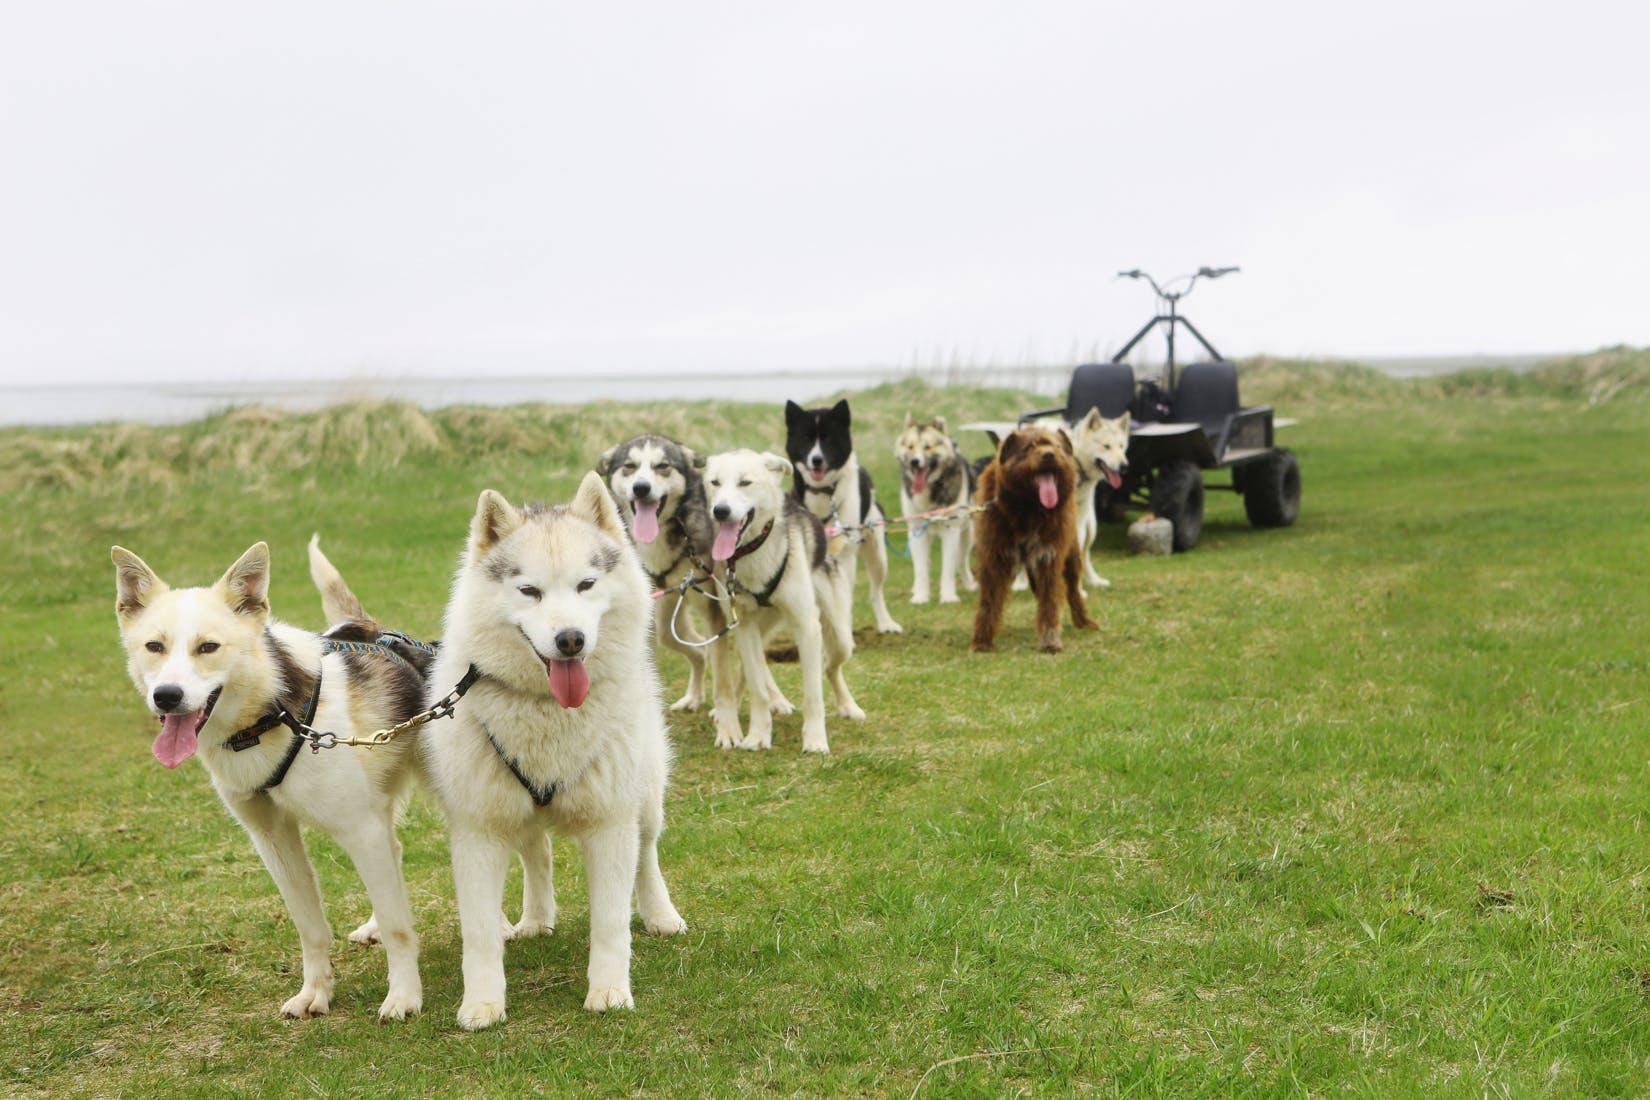 Hundeschlitten-Tour | Treffpunkt vor Ort